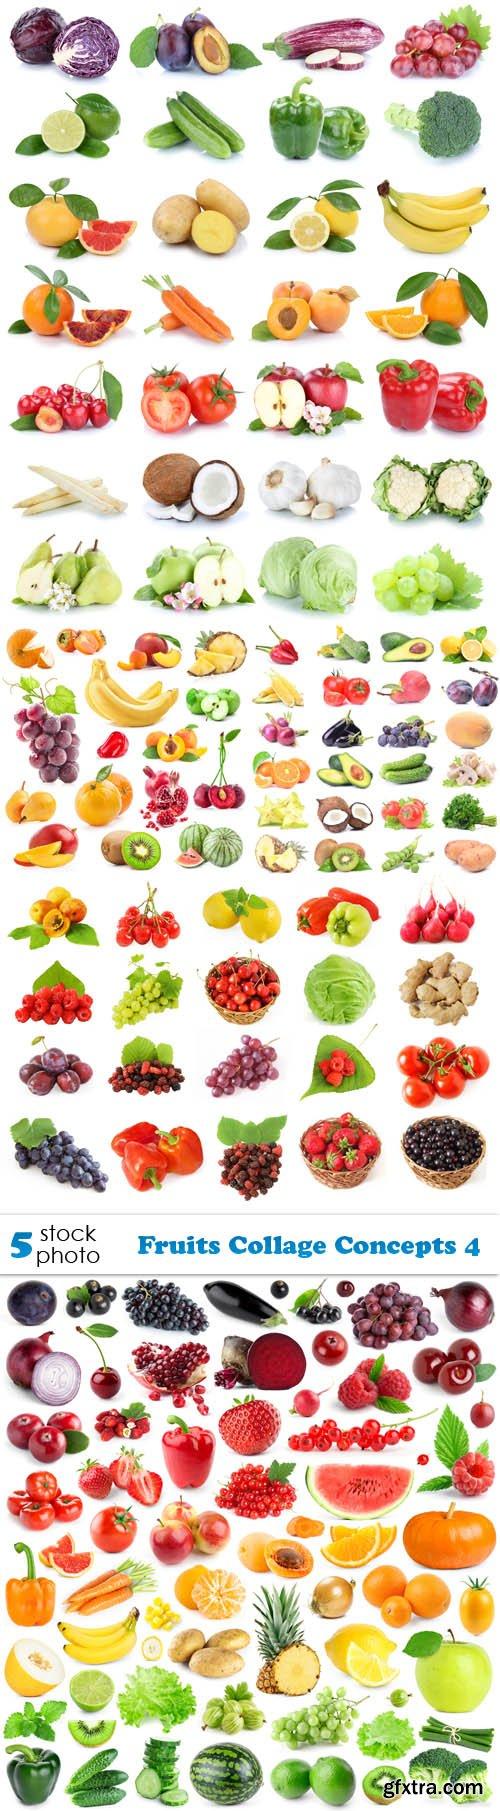 Photos - Fruits Collage Concepts 4